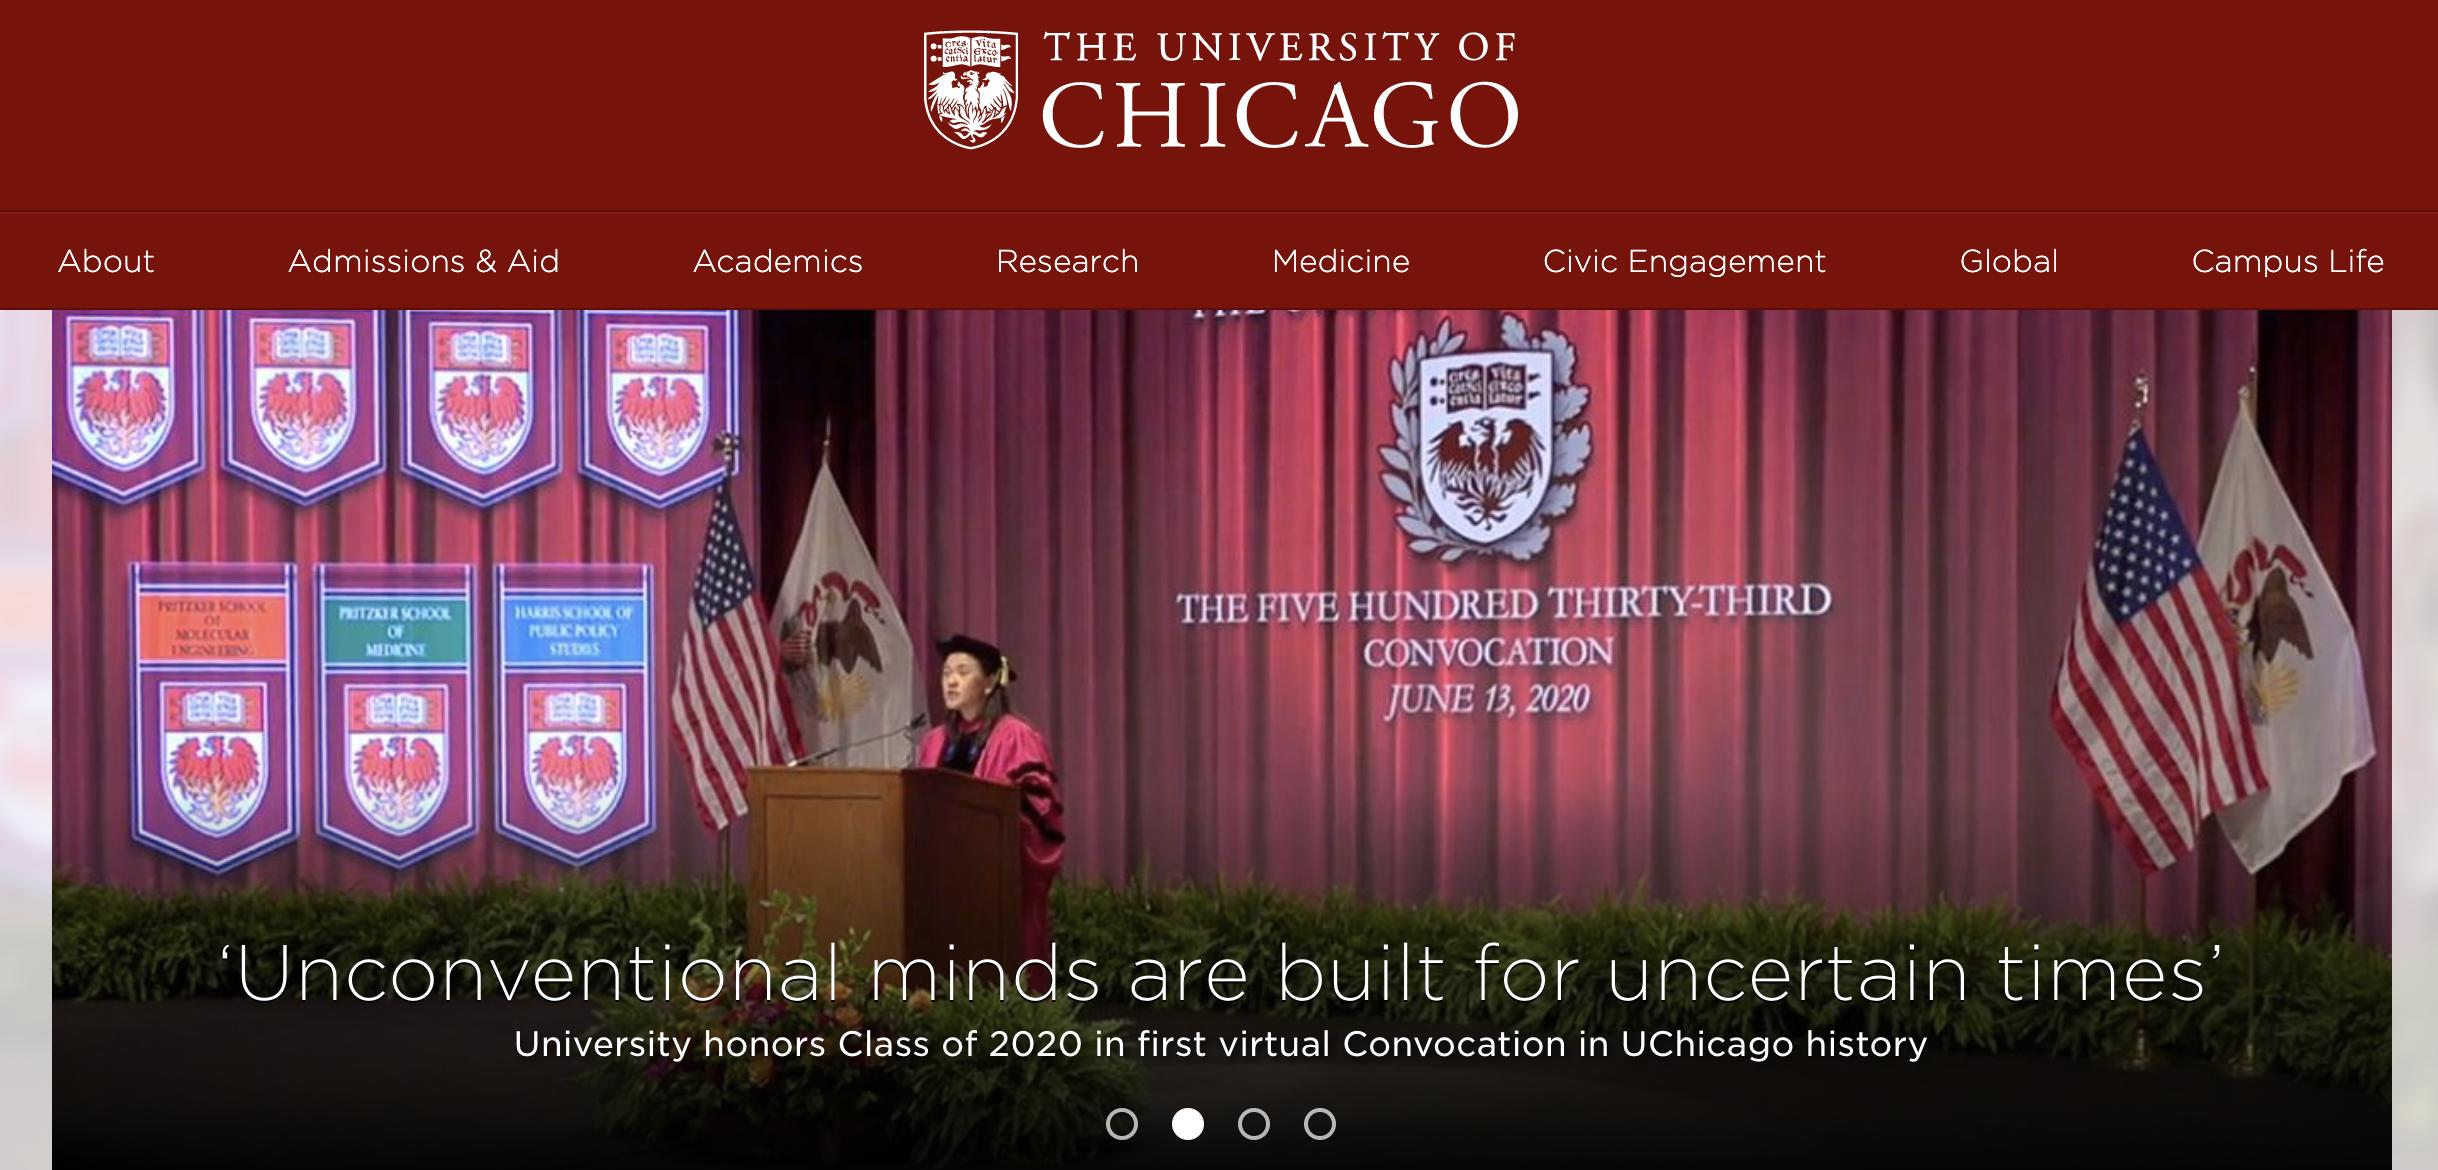 Chicago University website header